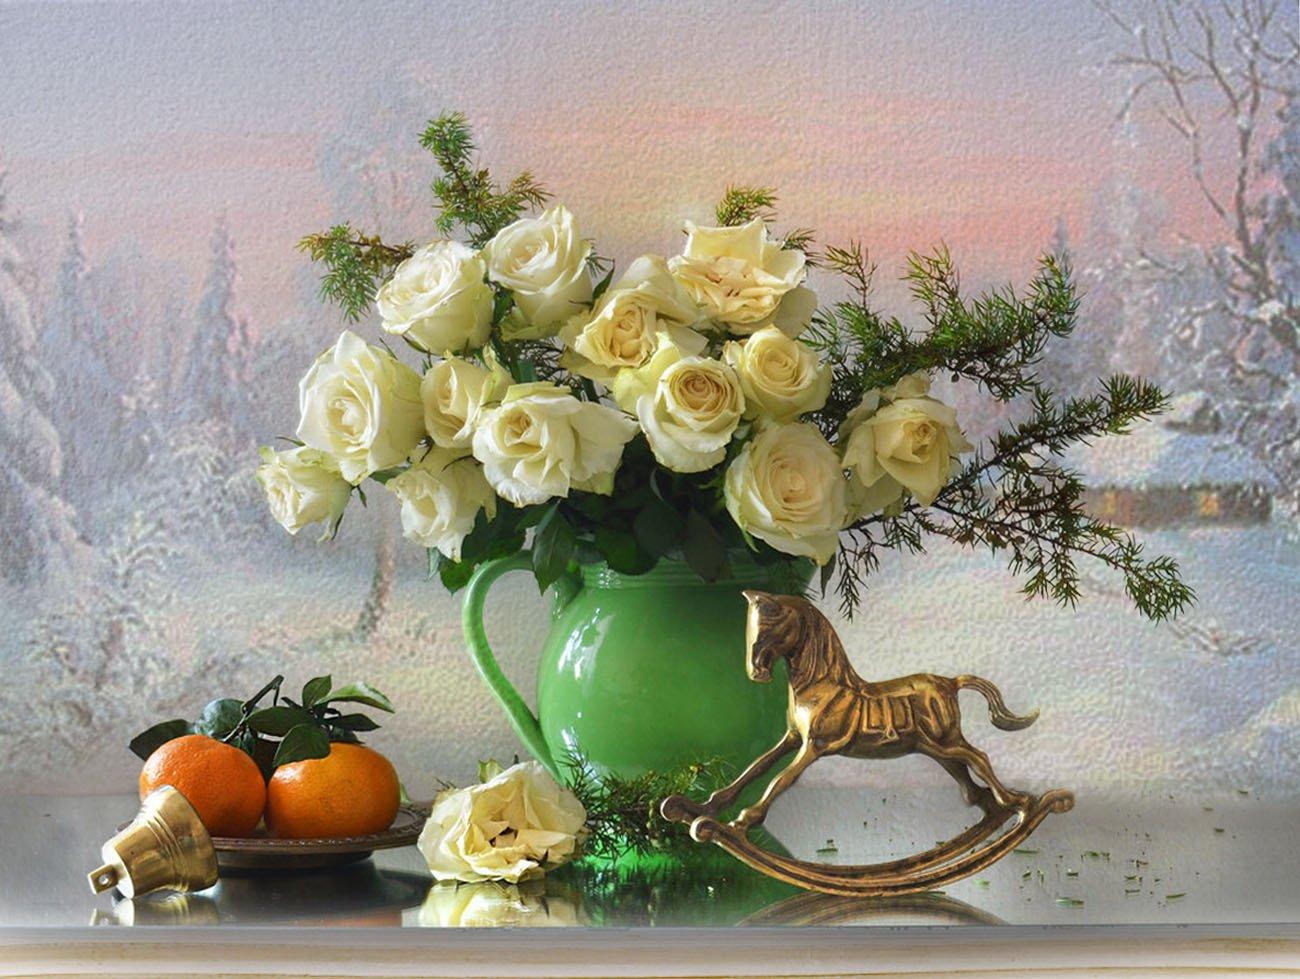 still life,натюрморт,фото натюрморт, зима, декабрь, розы, цветы, мандарины, статуэтка, бронза, Колова Валентина